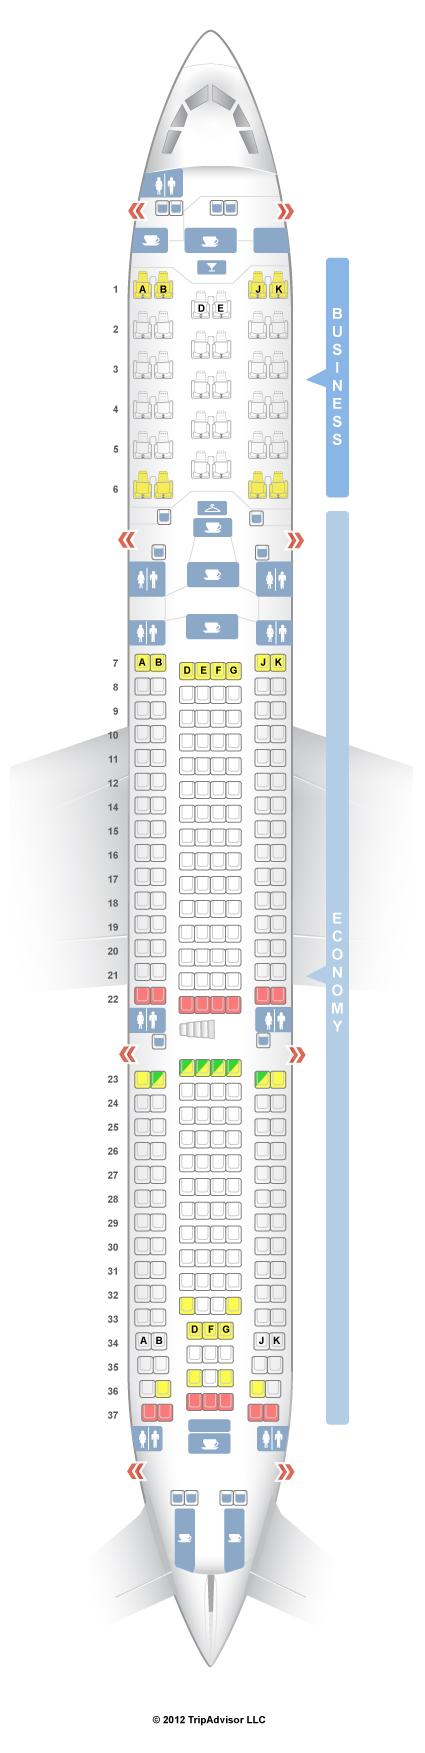 Avianca Seat Assignment Brokeasshomecom - Us airways a321 seat map